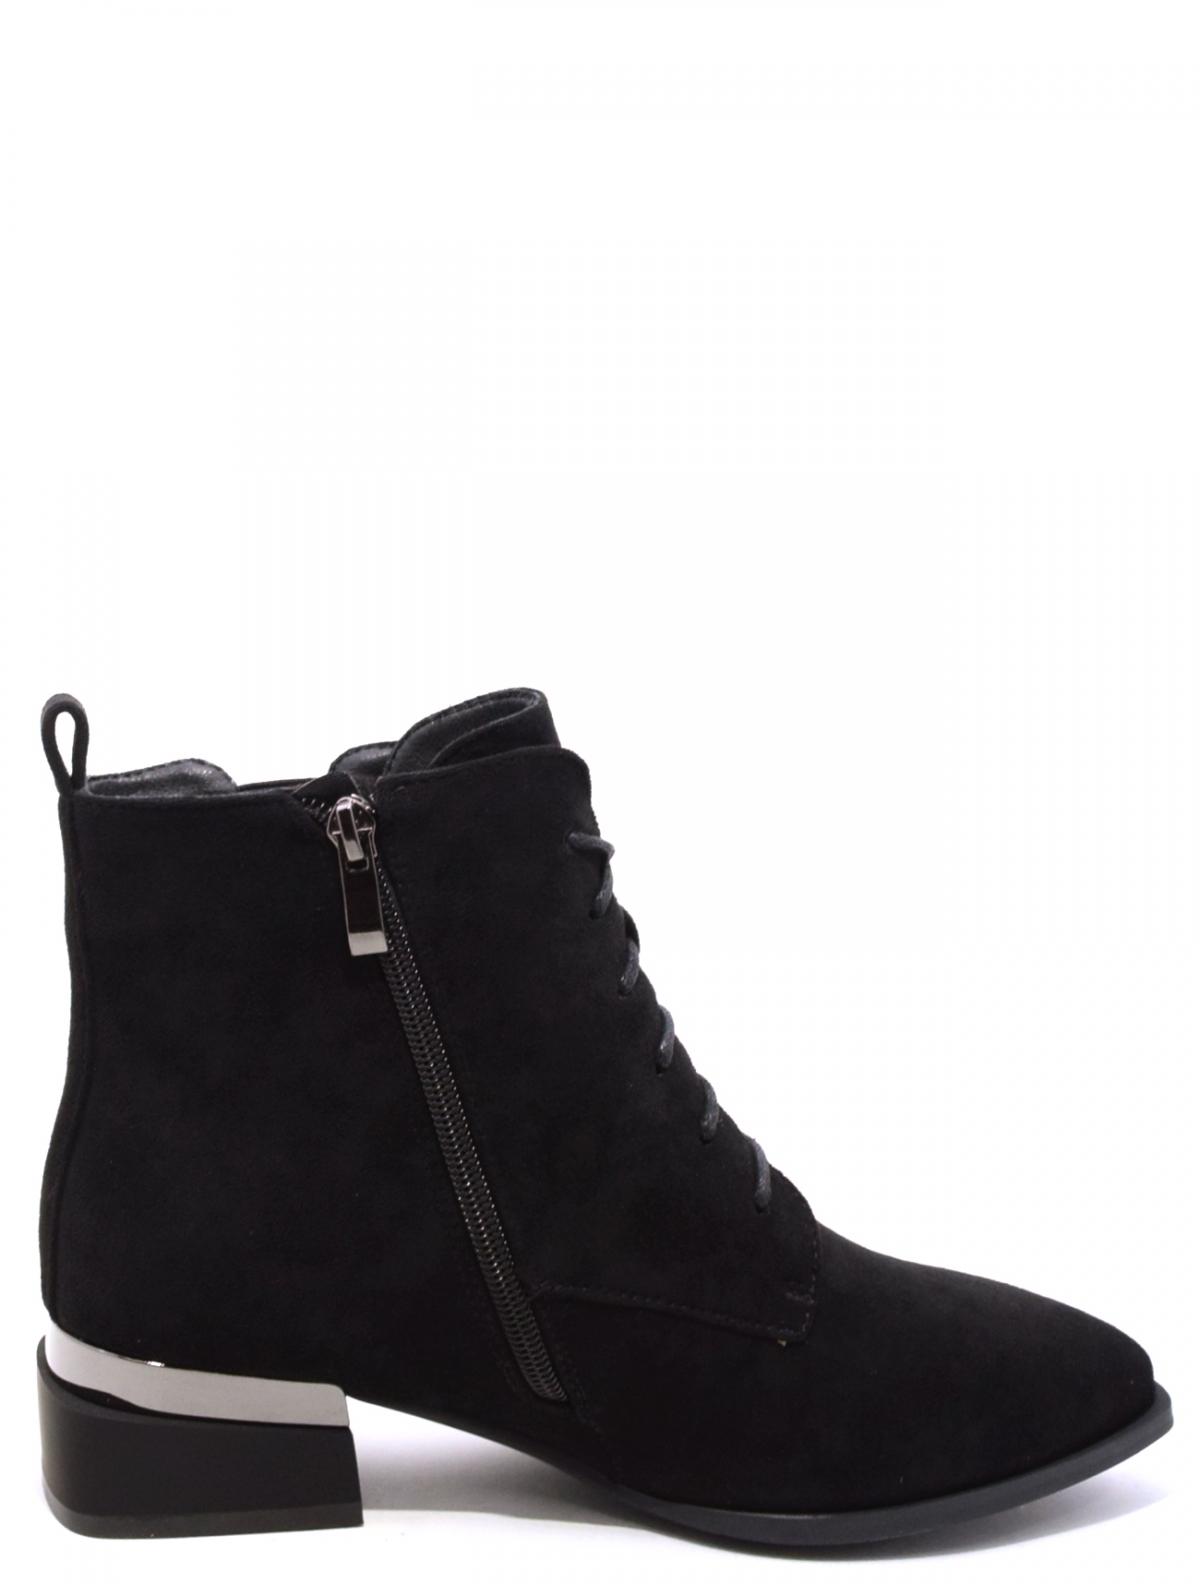 Admlis 5516 женские ботинки